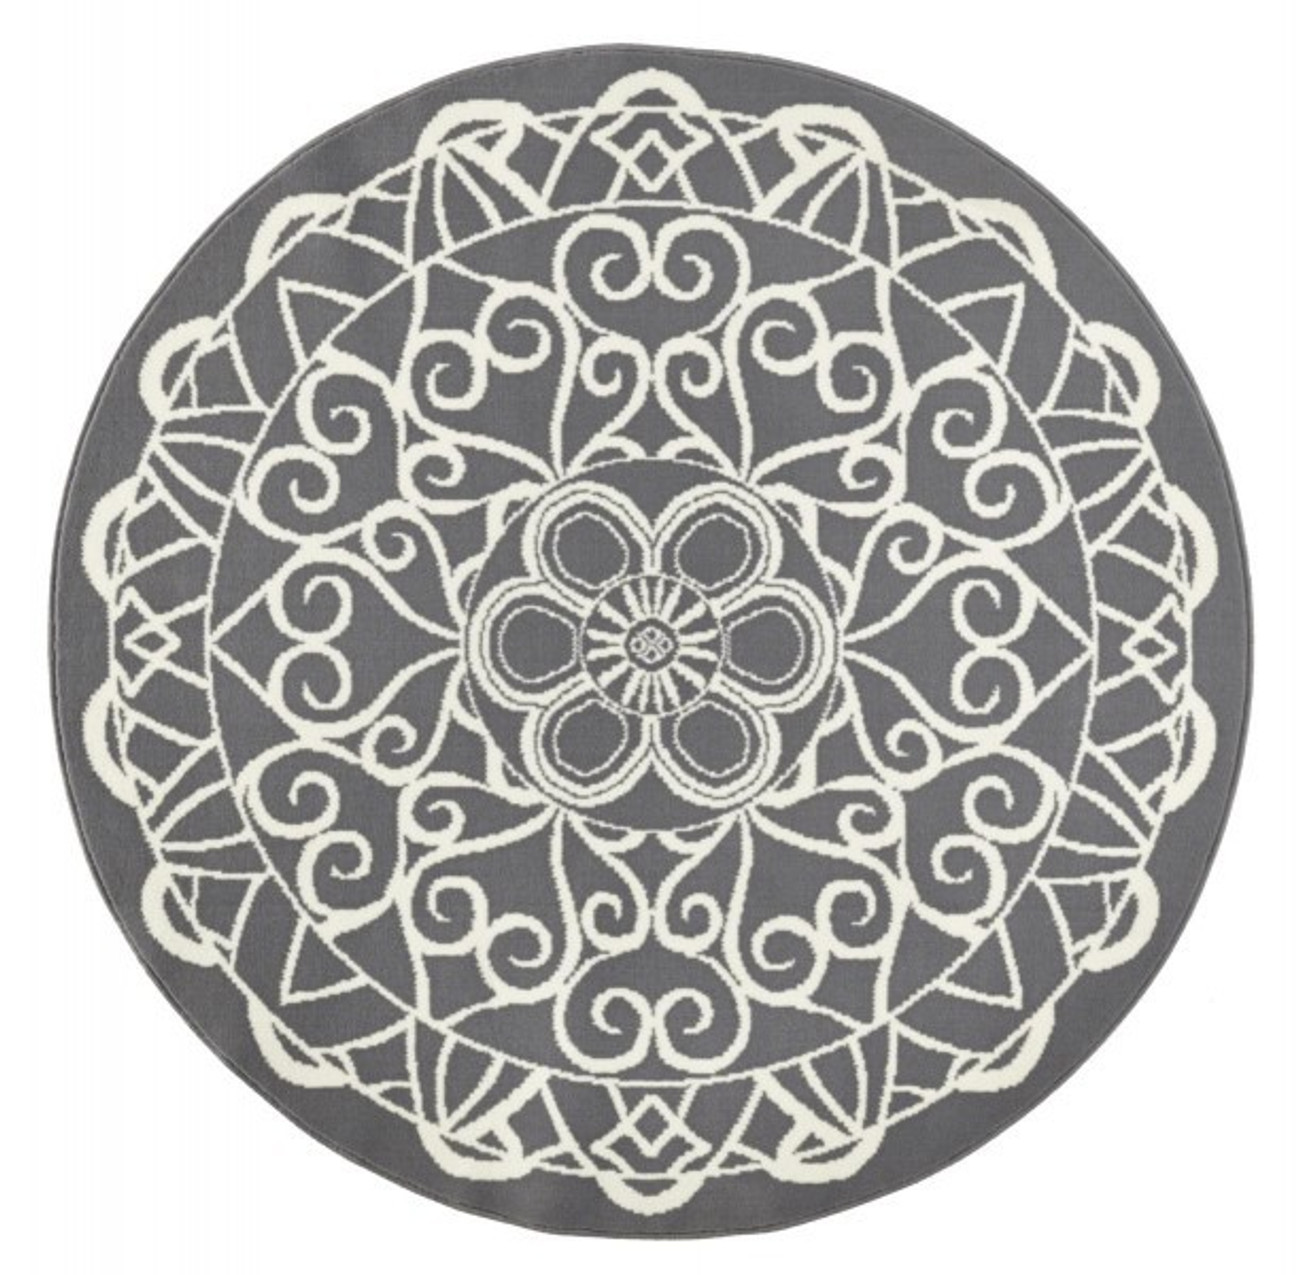 Teppich design rund  Designer Velours Teppich Mandala Grau Rund 140 cm Teppiche Design ...